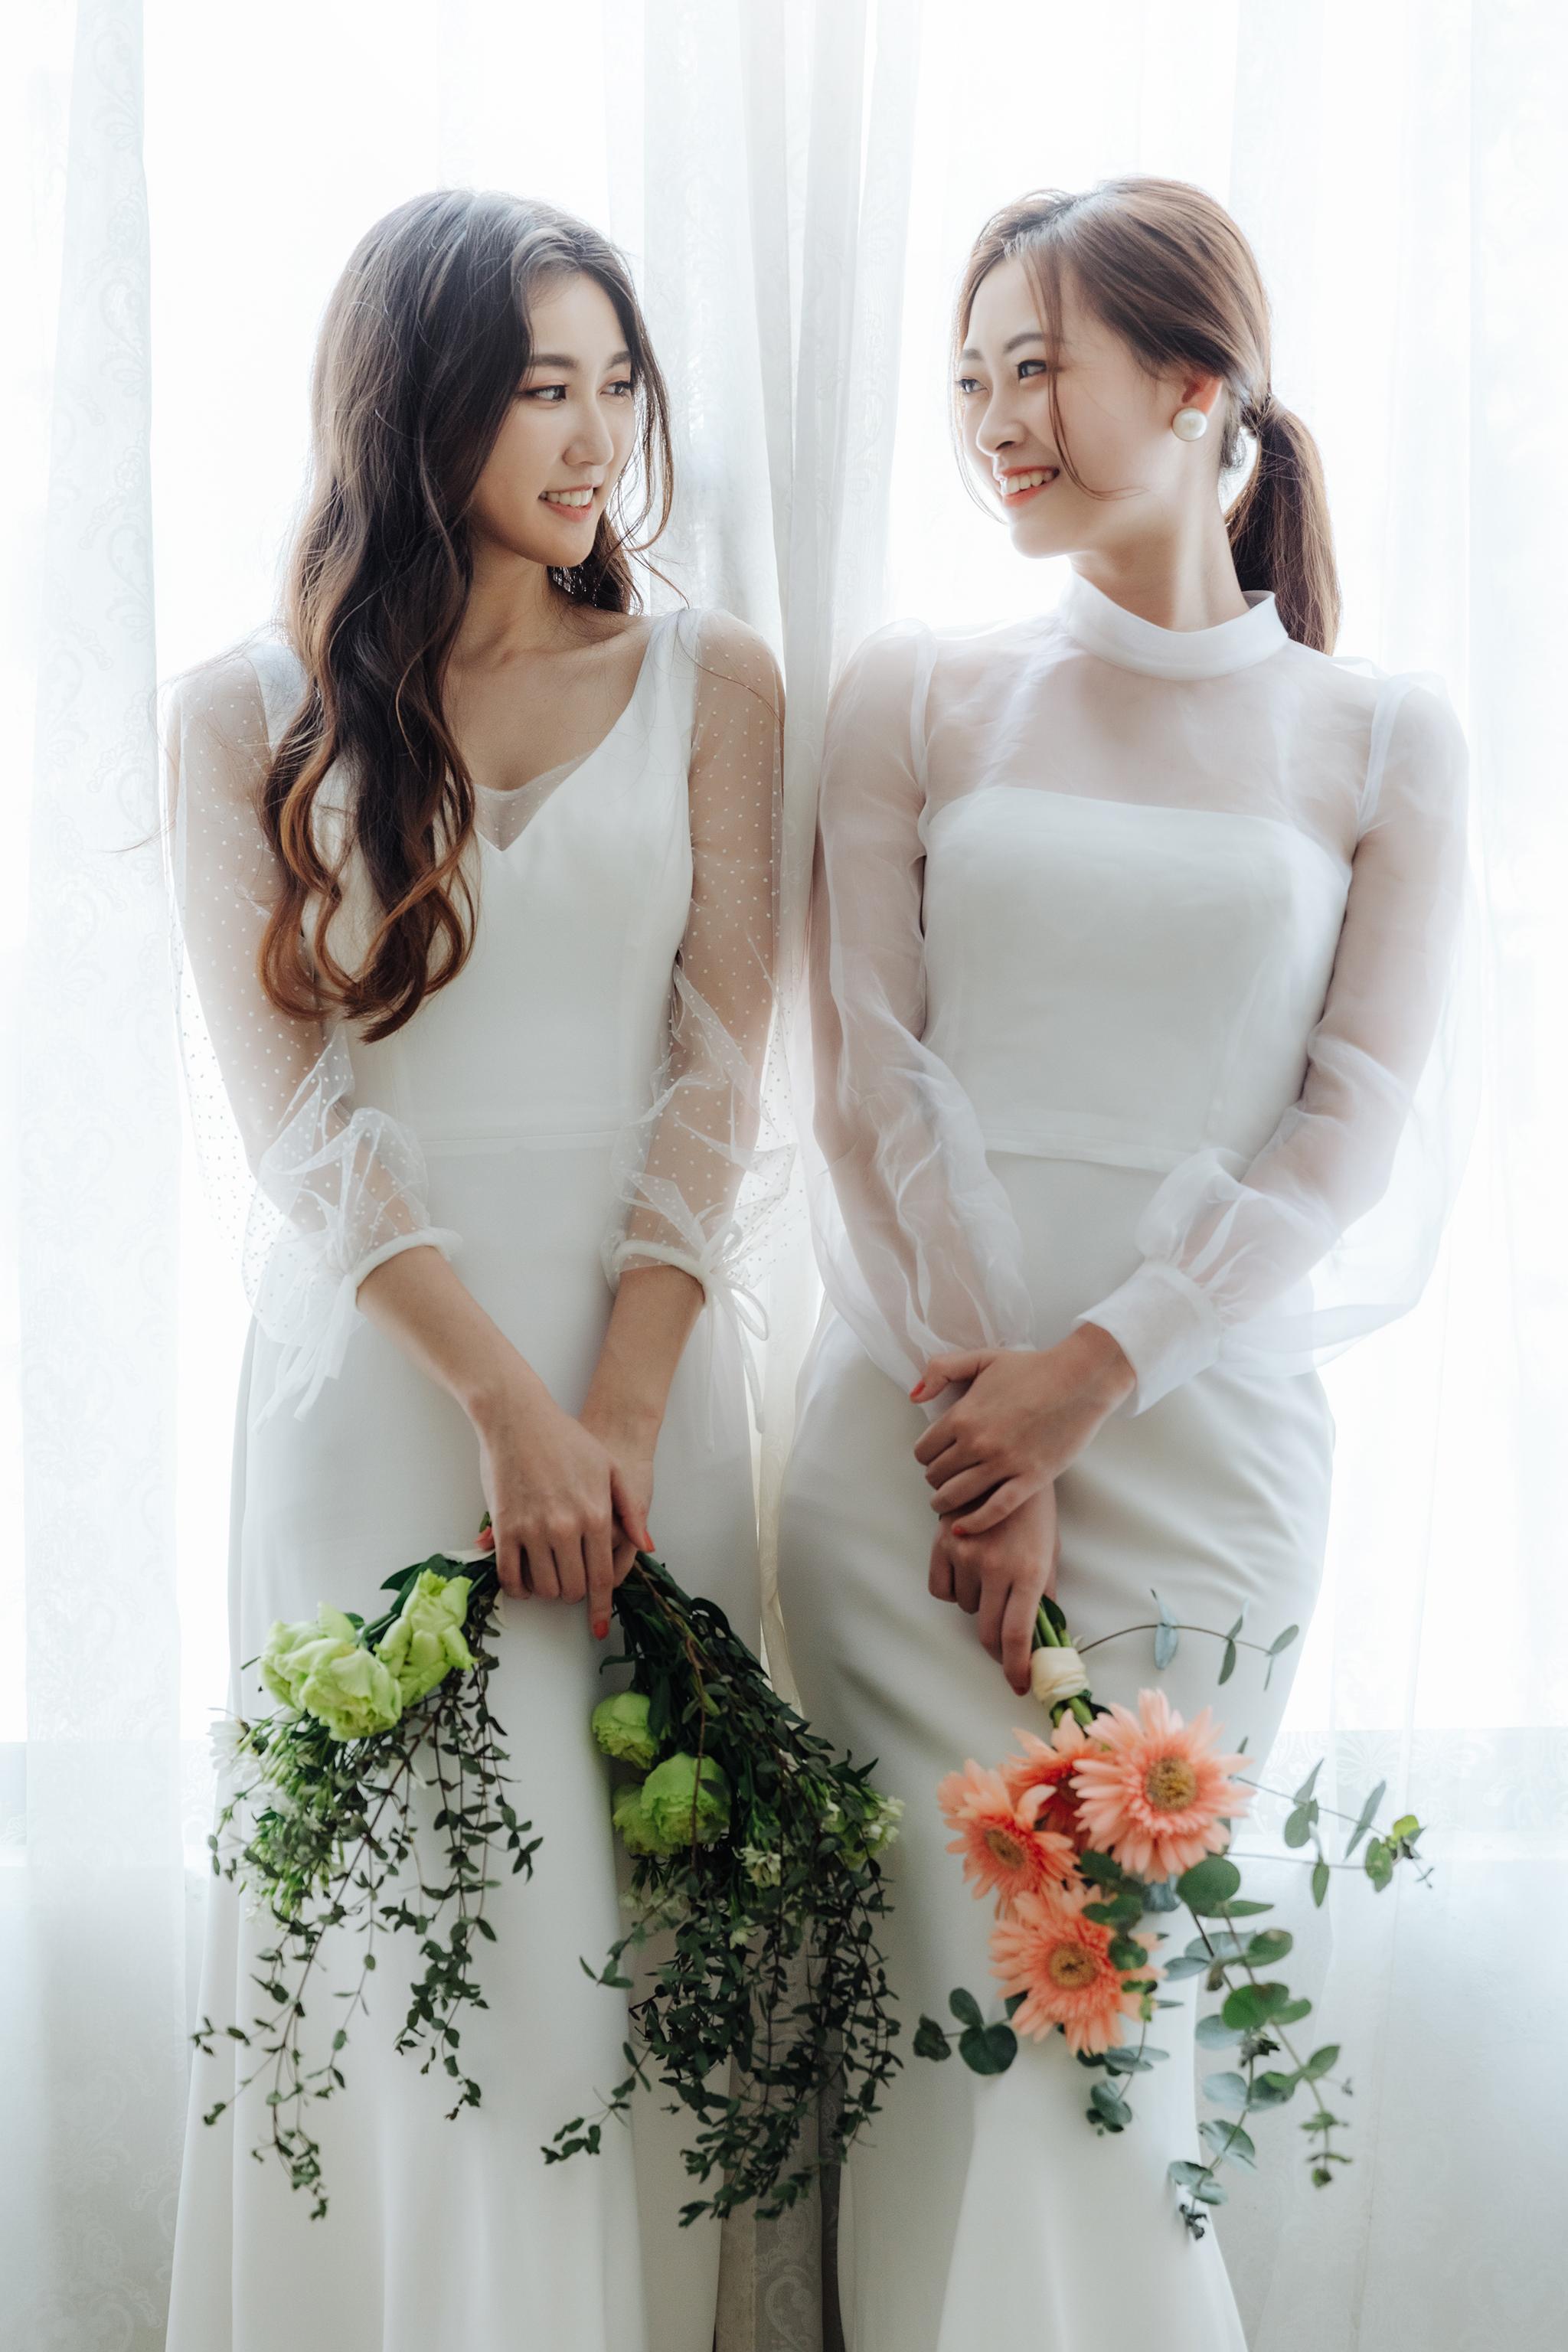 49929257981 5d83404d2e o - 【閨蜜婚紗】+Jessy & Tiffany+